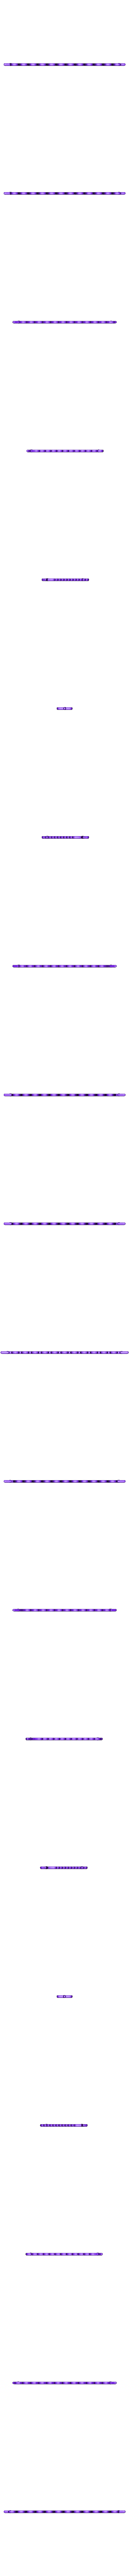 Female braid hair 04 C low.stl Download STL file female hair braid hair styling roller hair accessories for girl headdress weaving tool 3d print cnc • 3D printing object, Dzusto